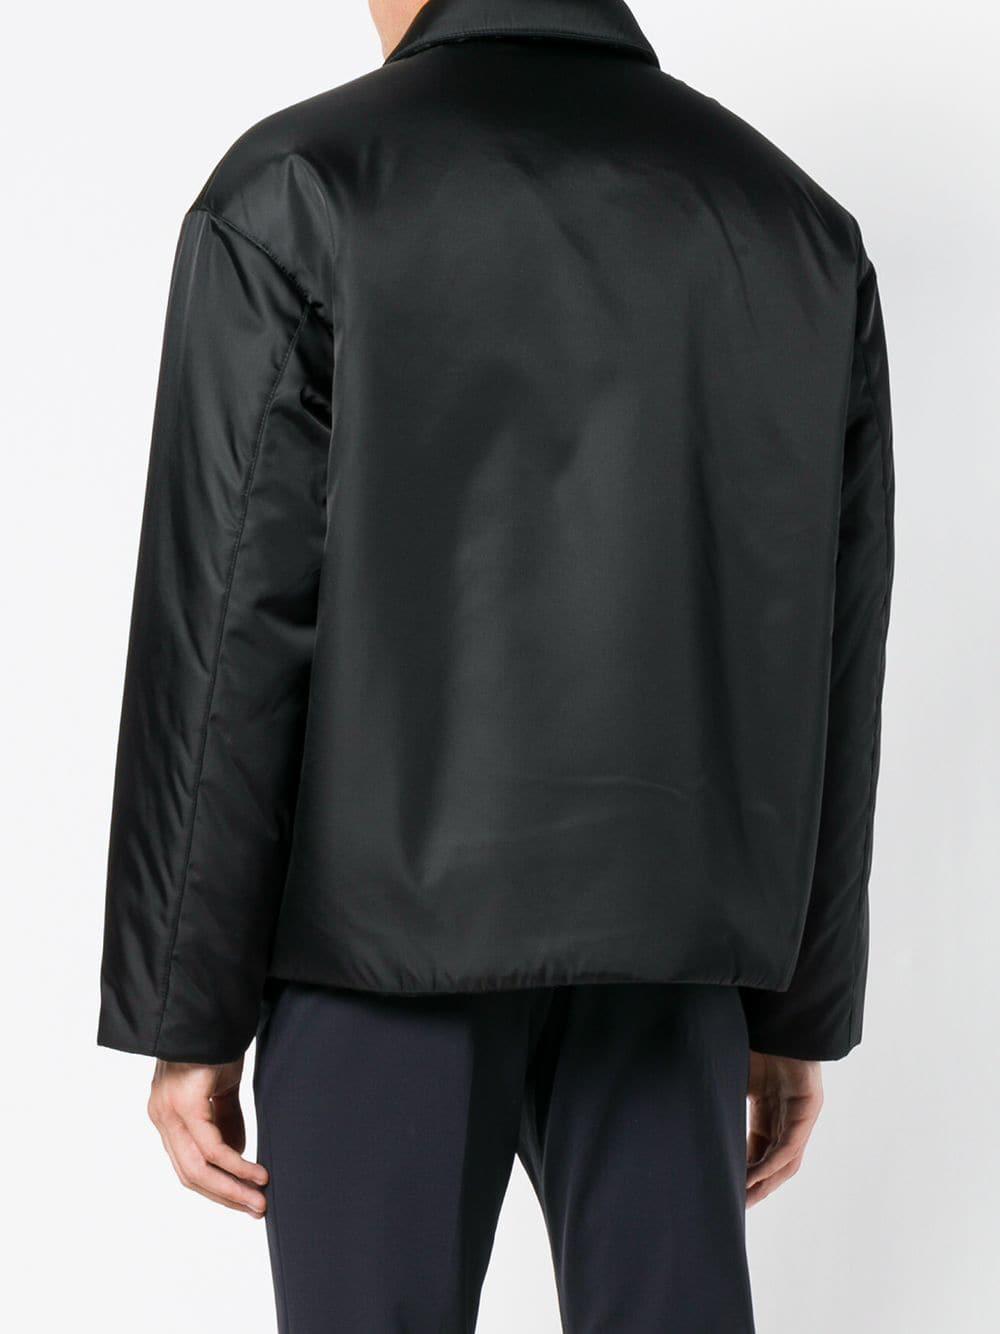 a5474ddd7e09 Lyst - Prada Classic Jacket in Black for Men